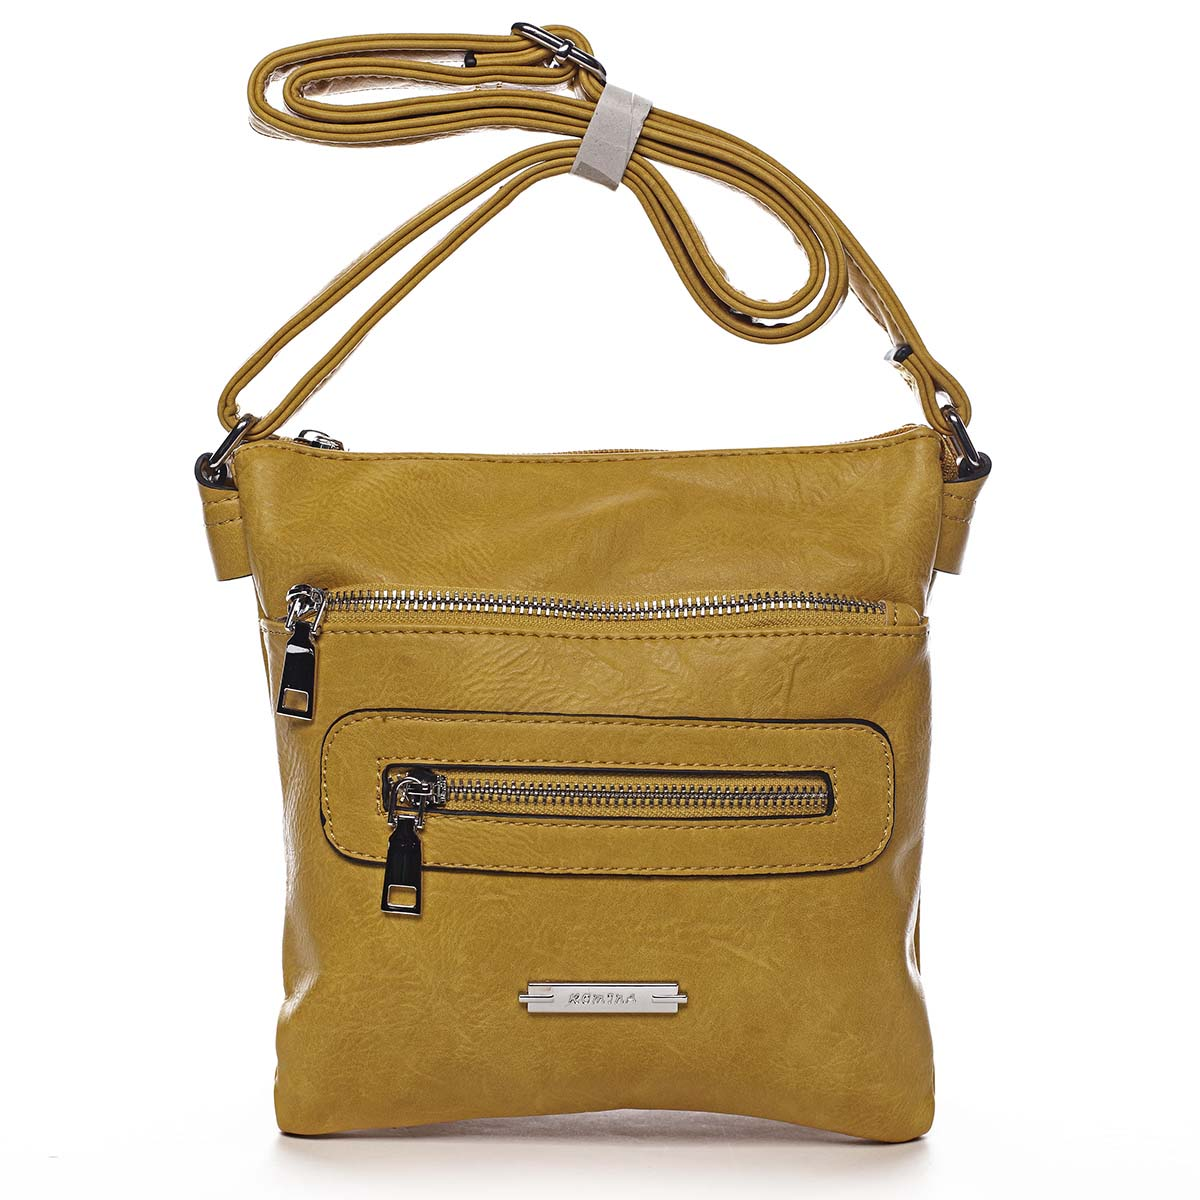 Dámská crossbody kabelka žlutá - Romina Chasing